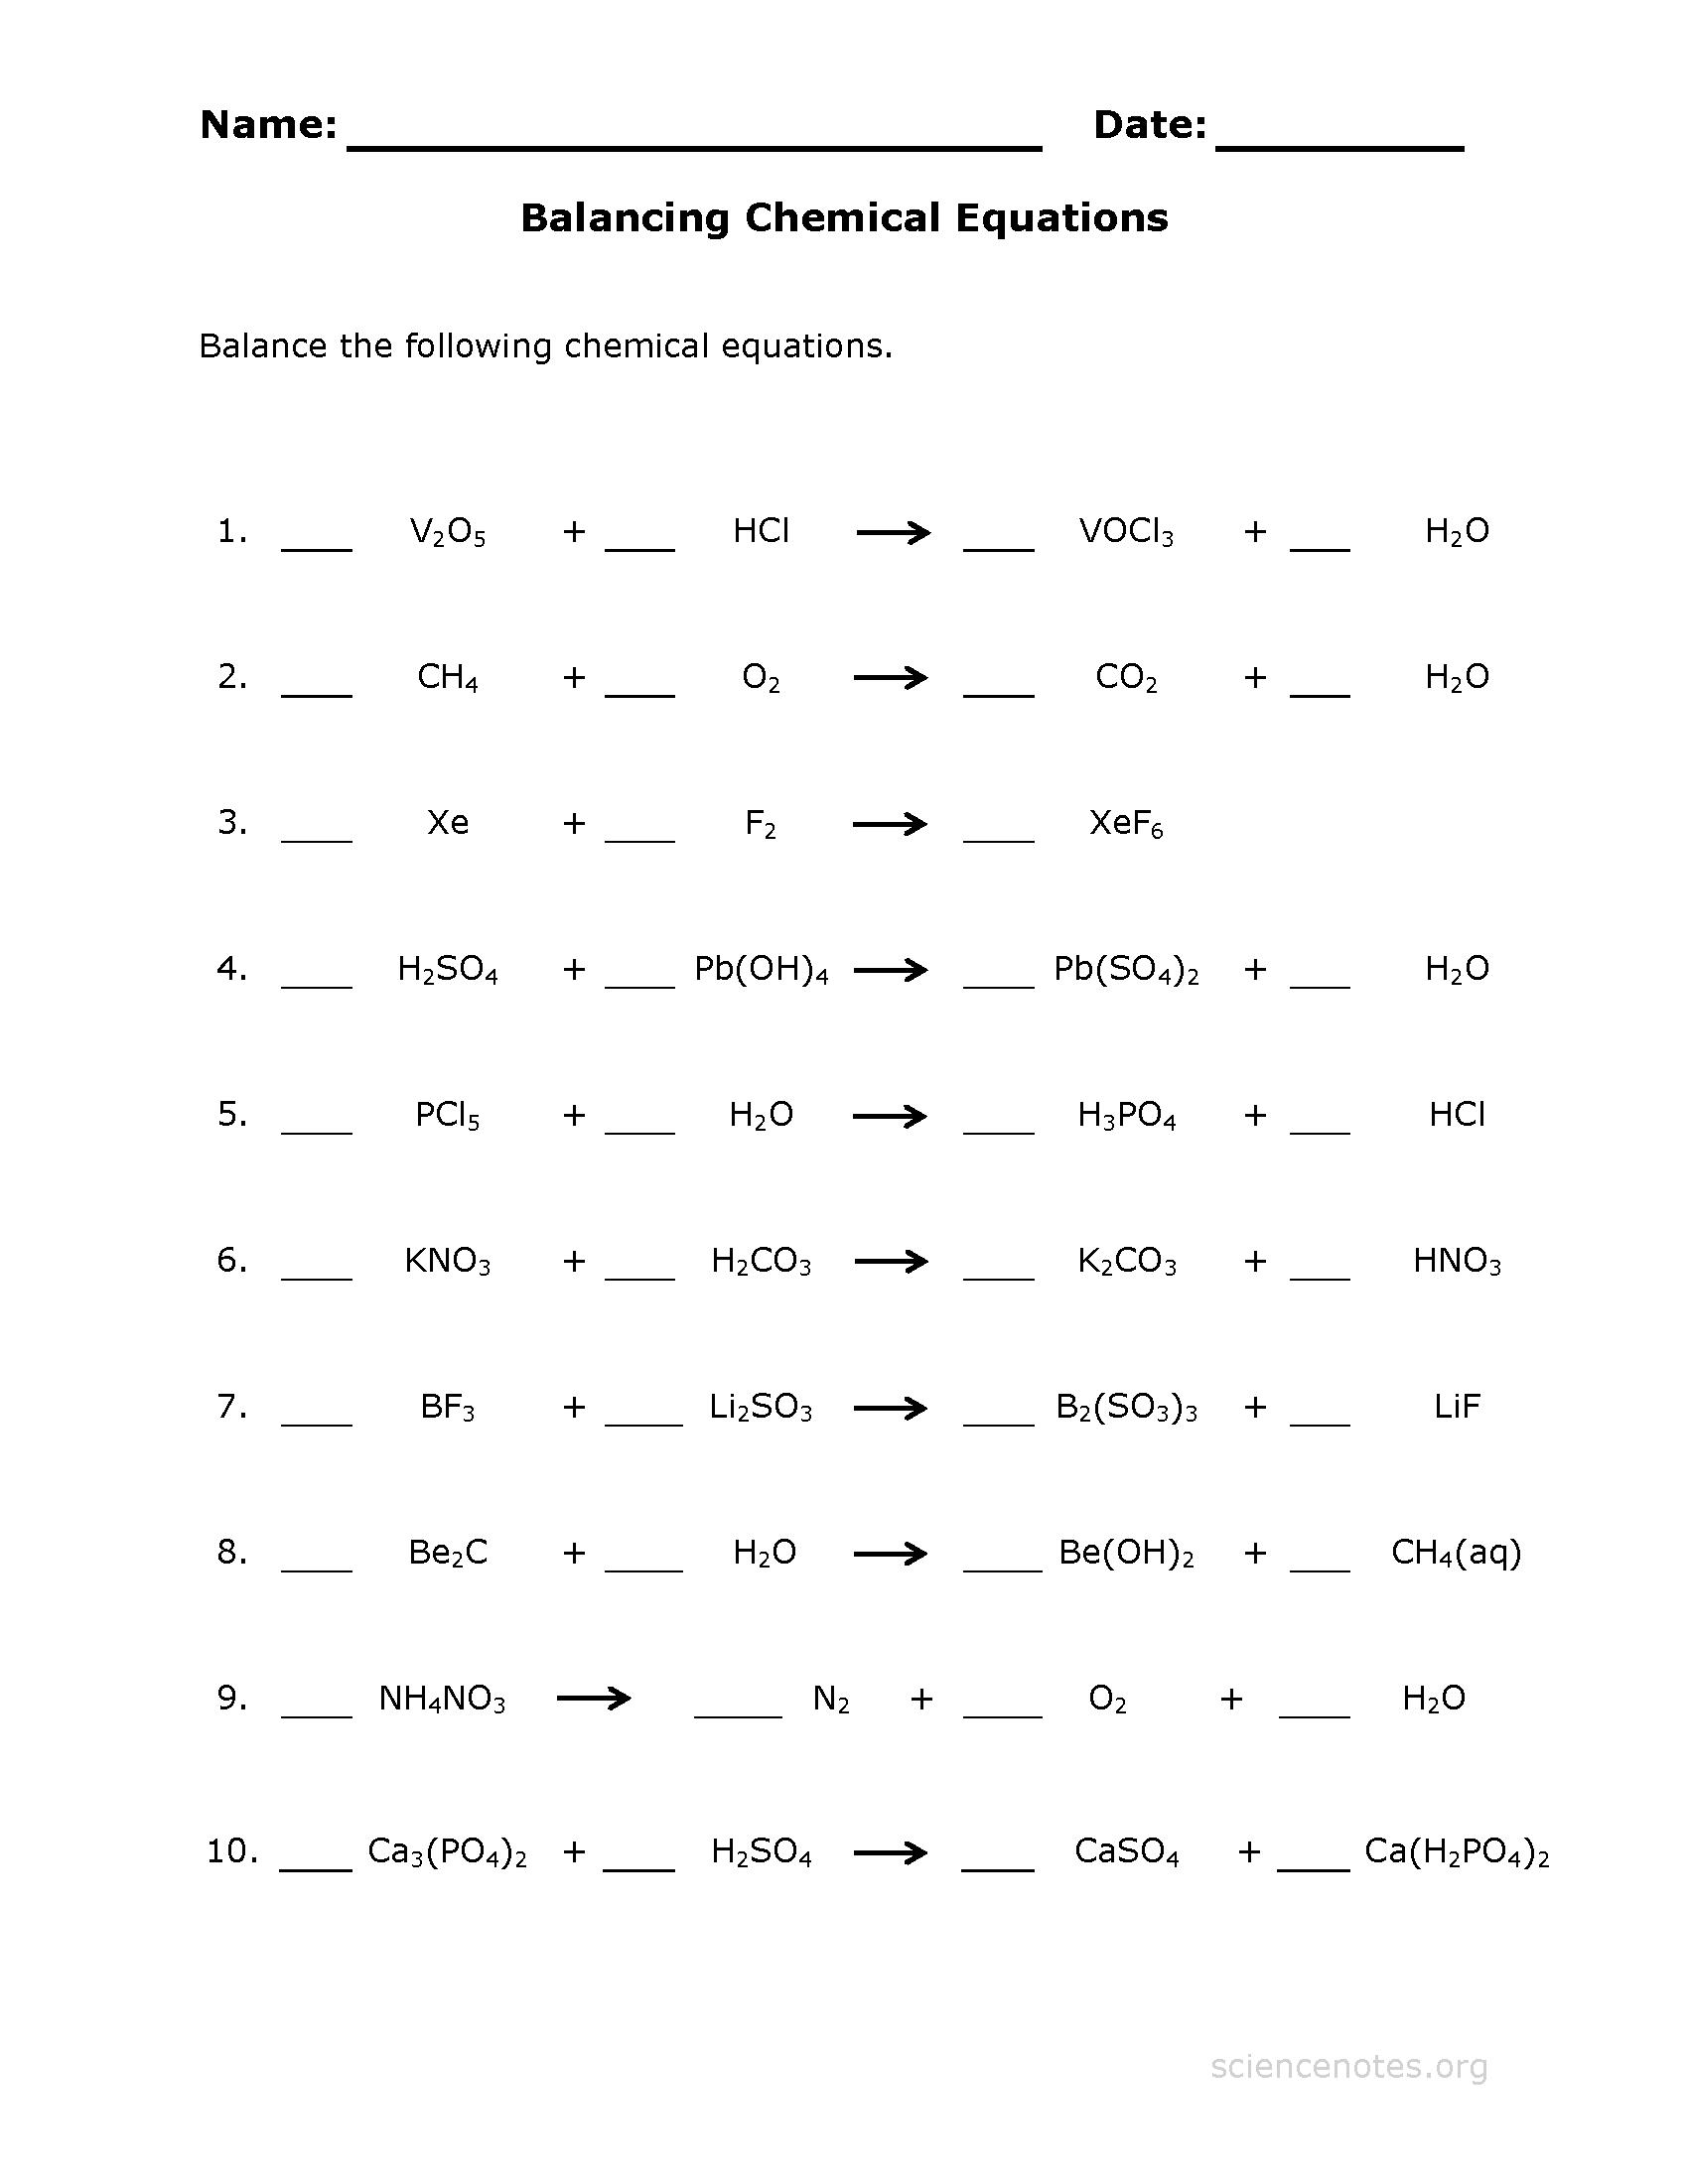 Easy Balancing Chemical Equations Worksheet 107780